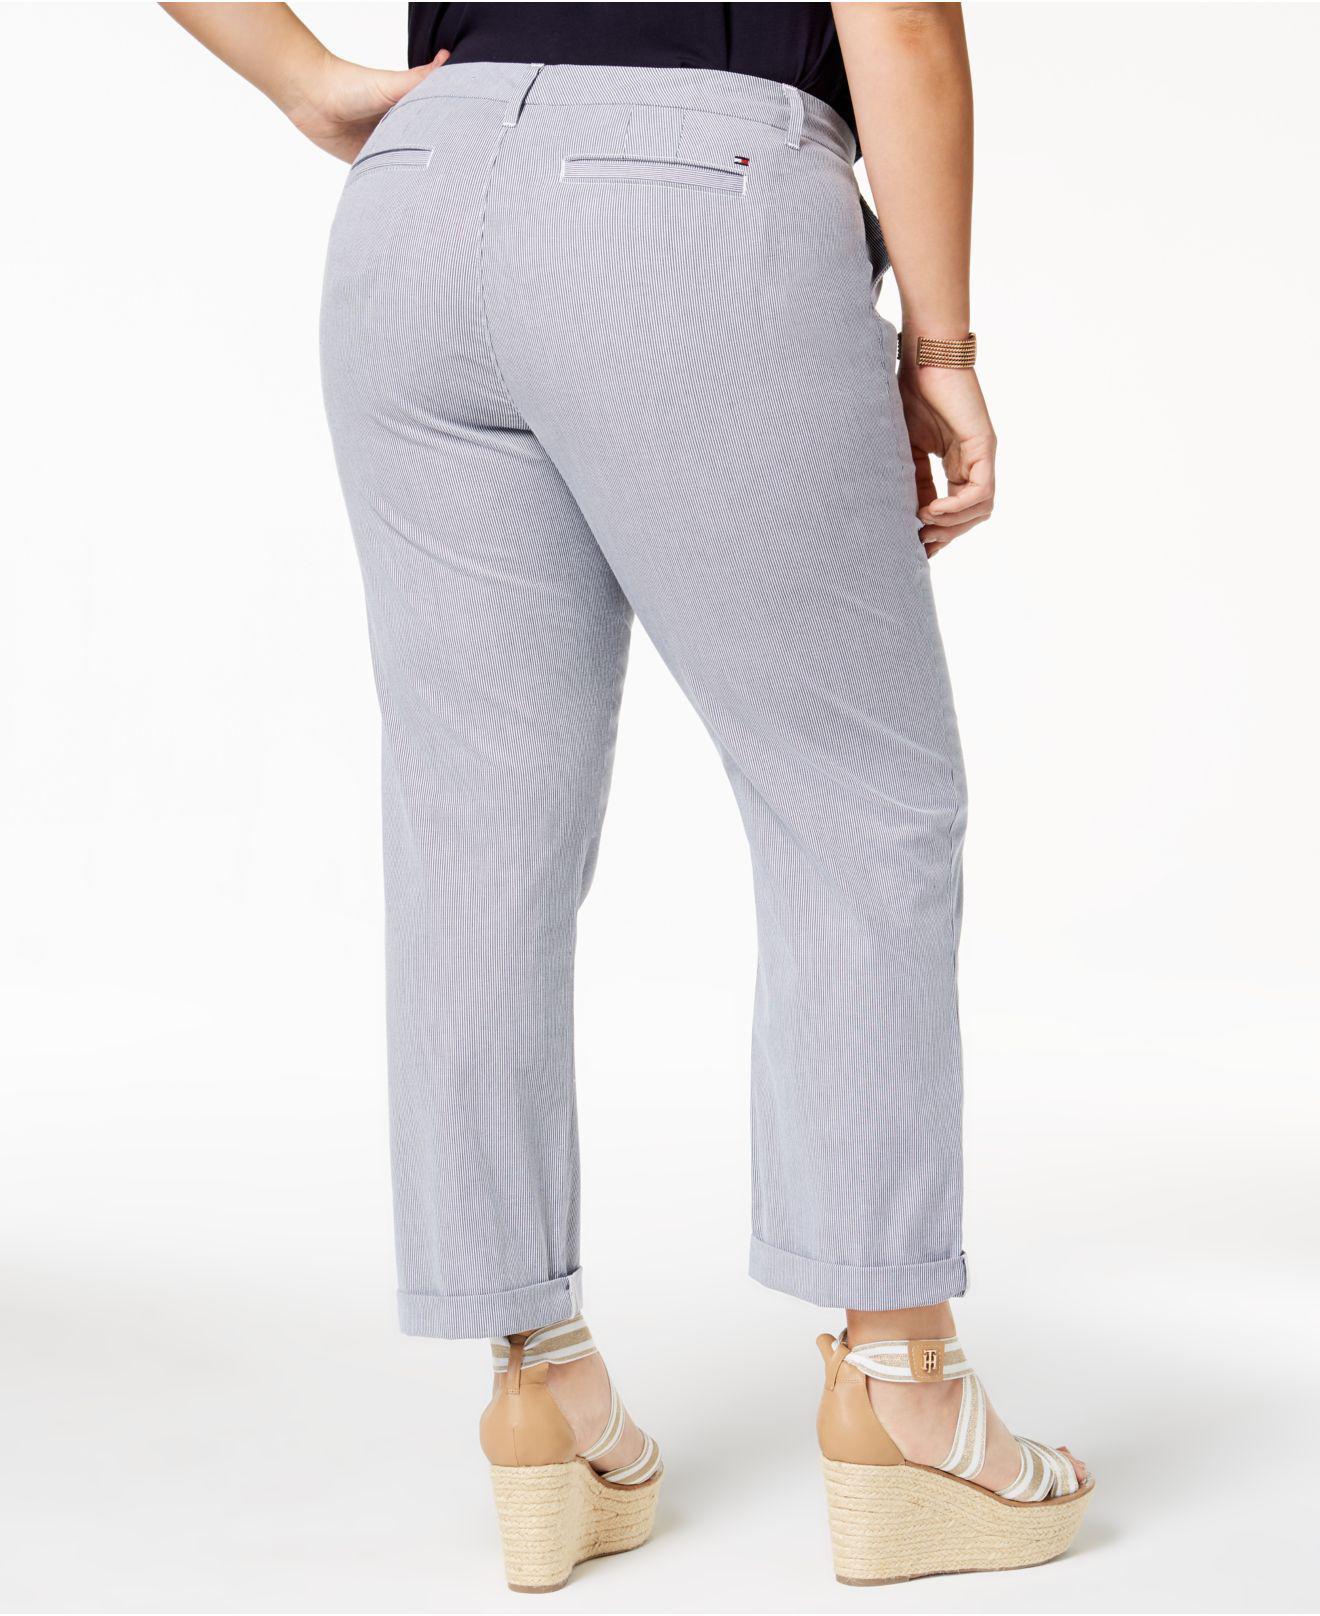 daa98e918d6 Lyst - Tommy Hilfiger Plus Size Pinstripe Ankle Pants